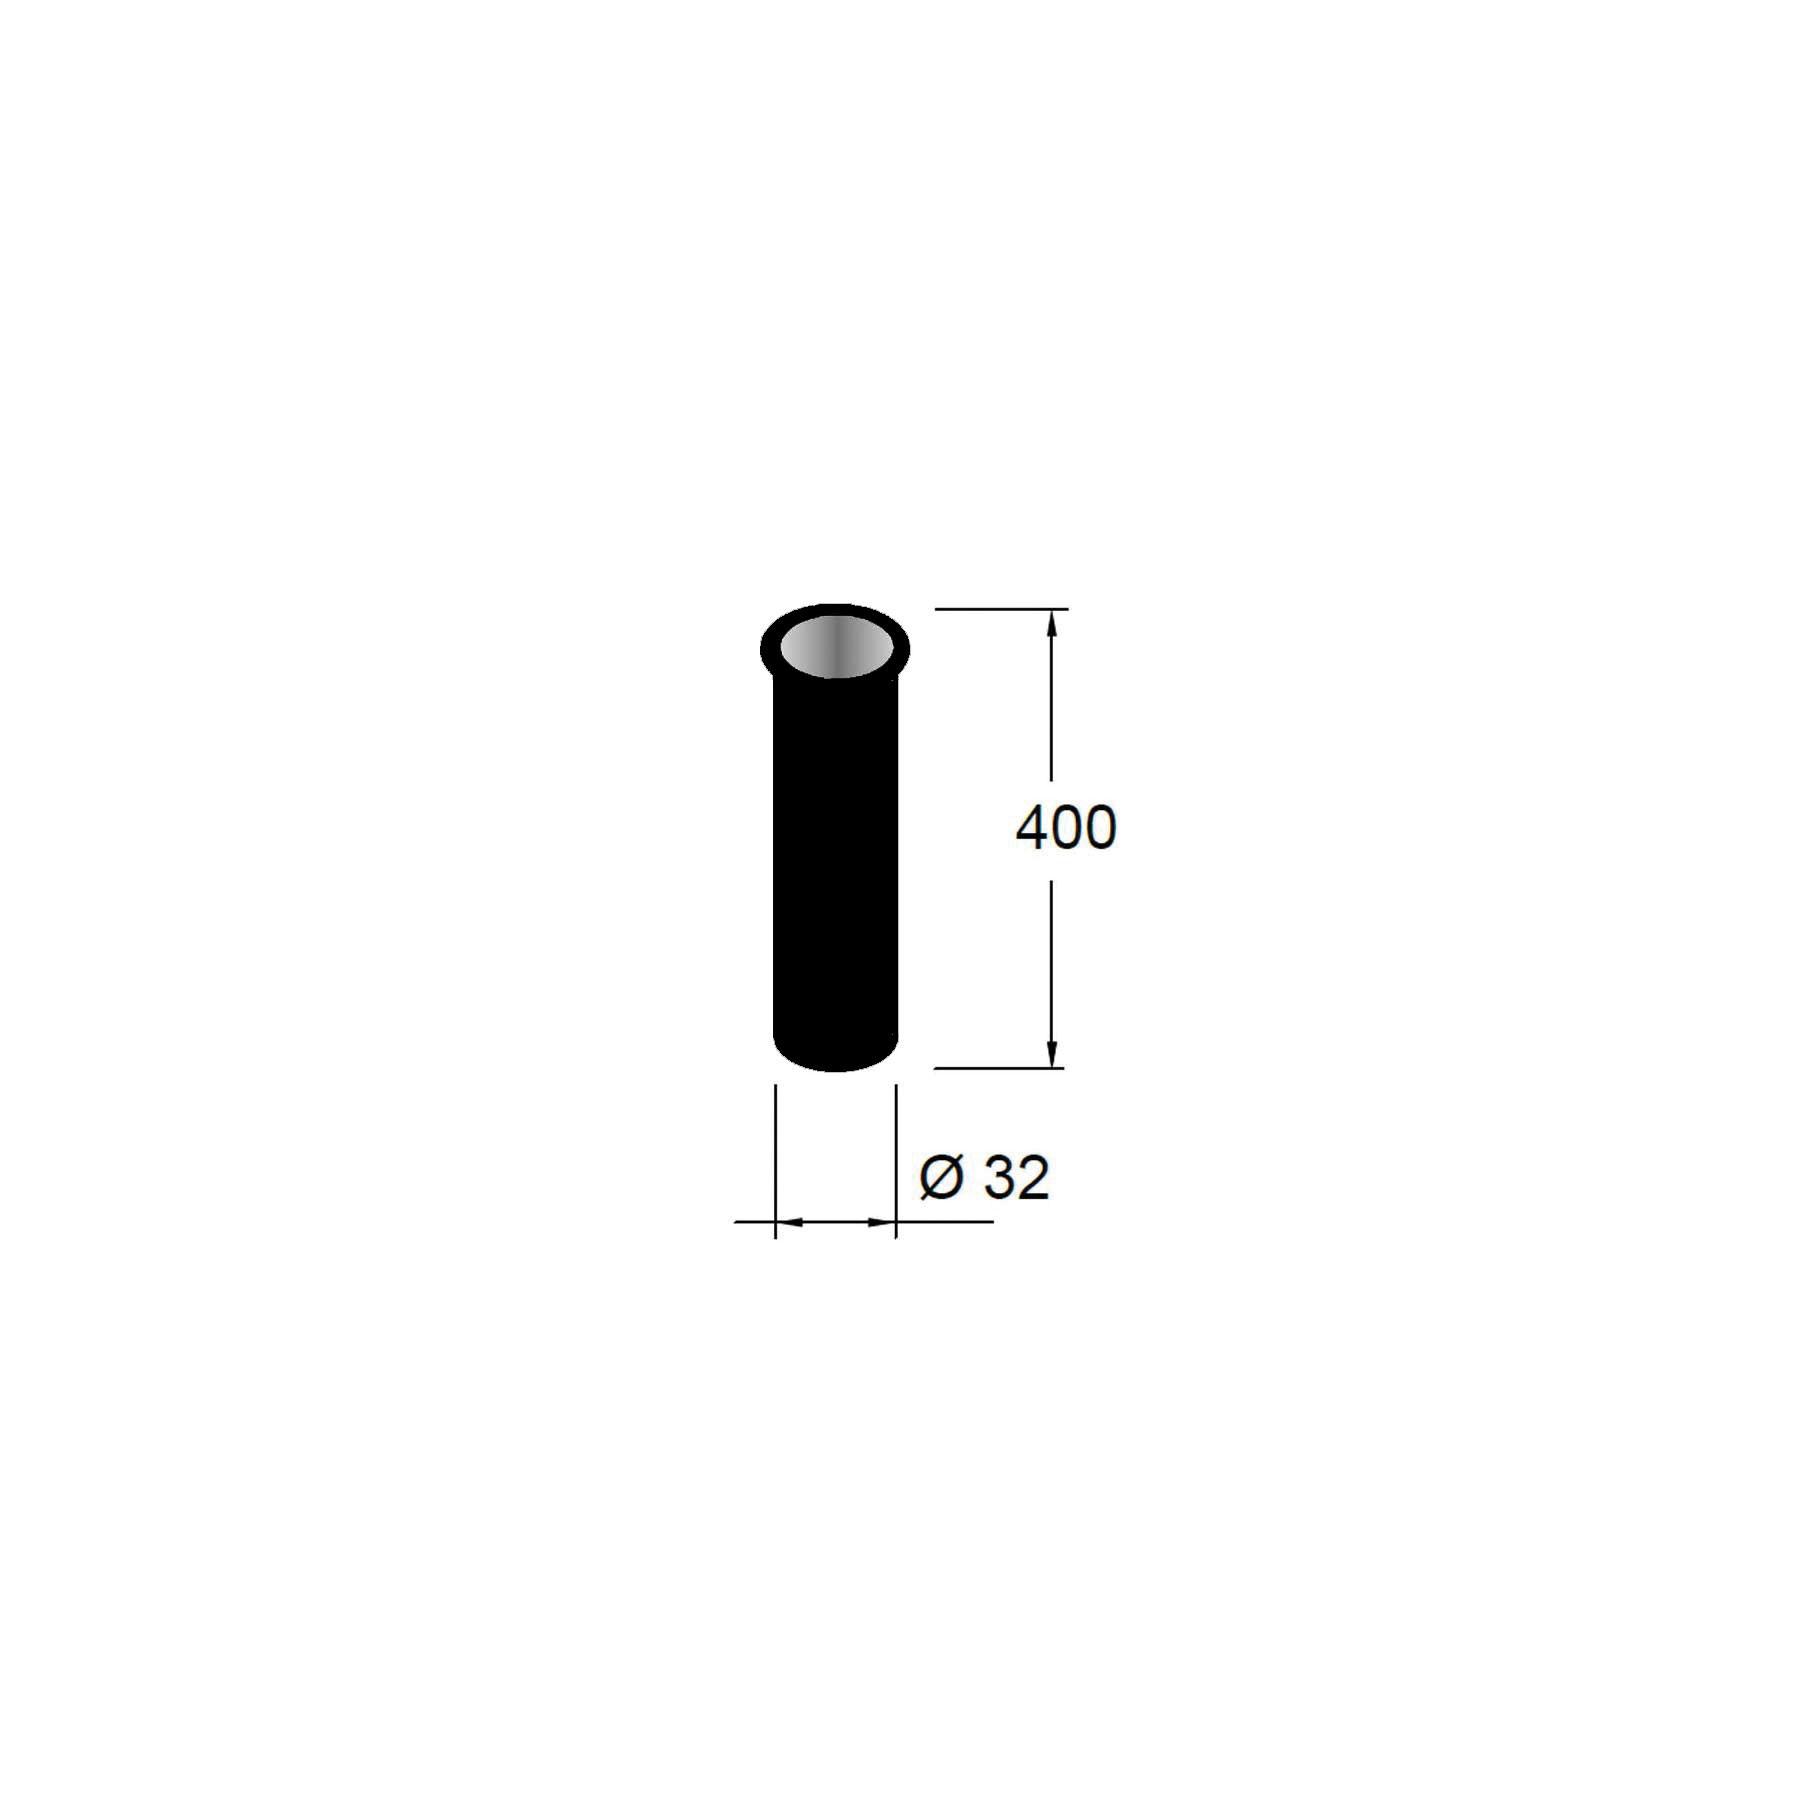 Muebles Vinci mat zwarte sifon verlengbuis 40cm met kraag